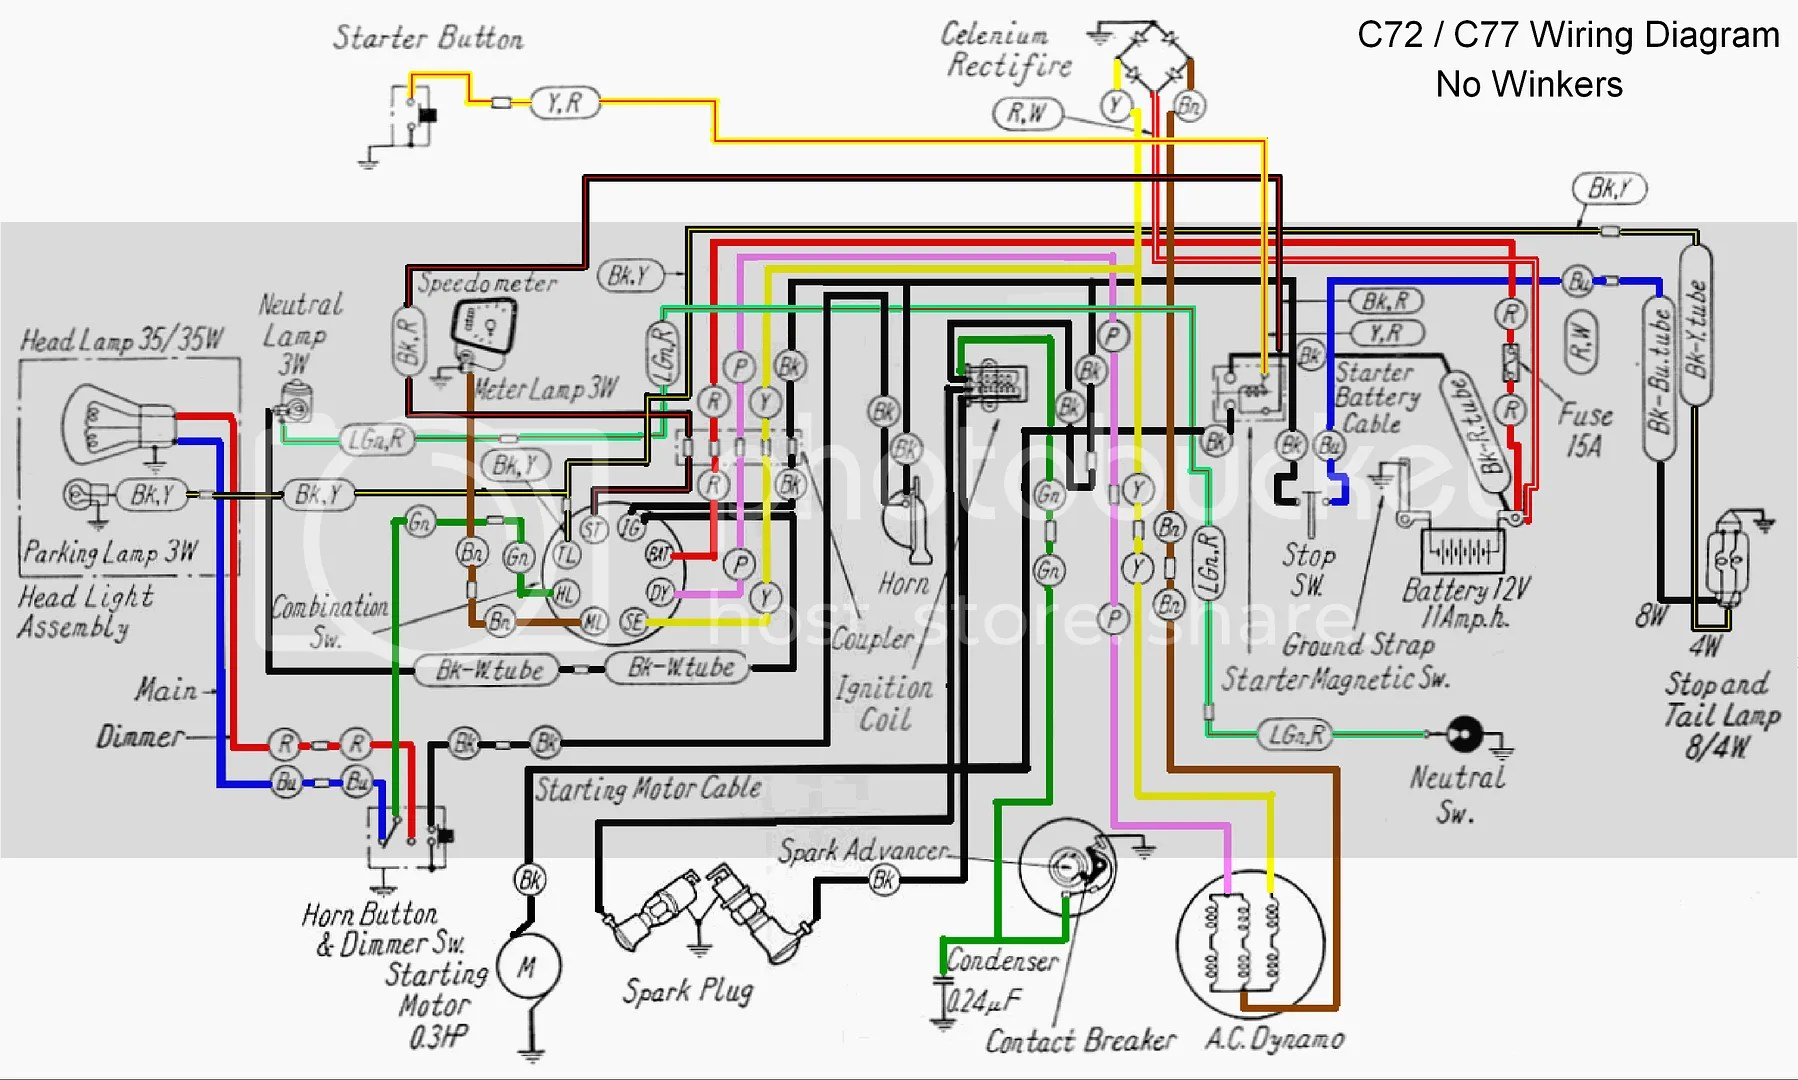 hight resolution of ca77 wiring diagram wiring diagram schemes gl1100 wiring diagram honda cl77 wiring diagram